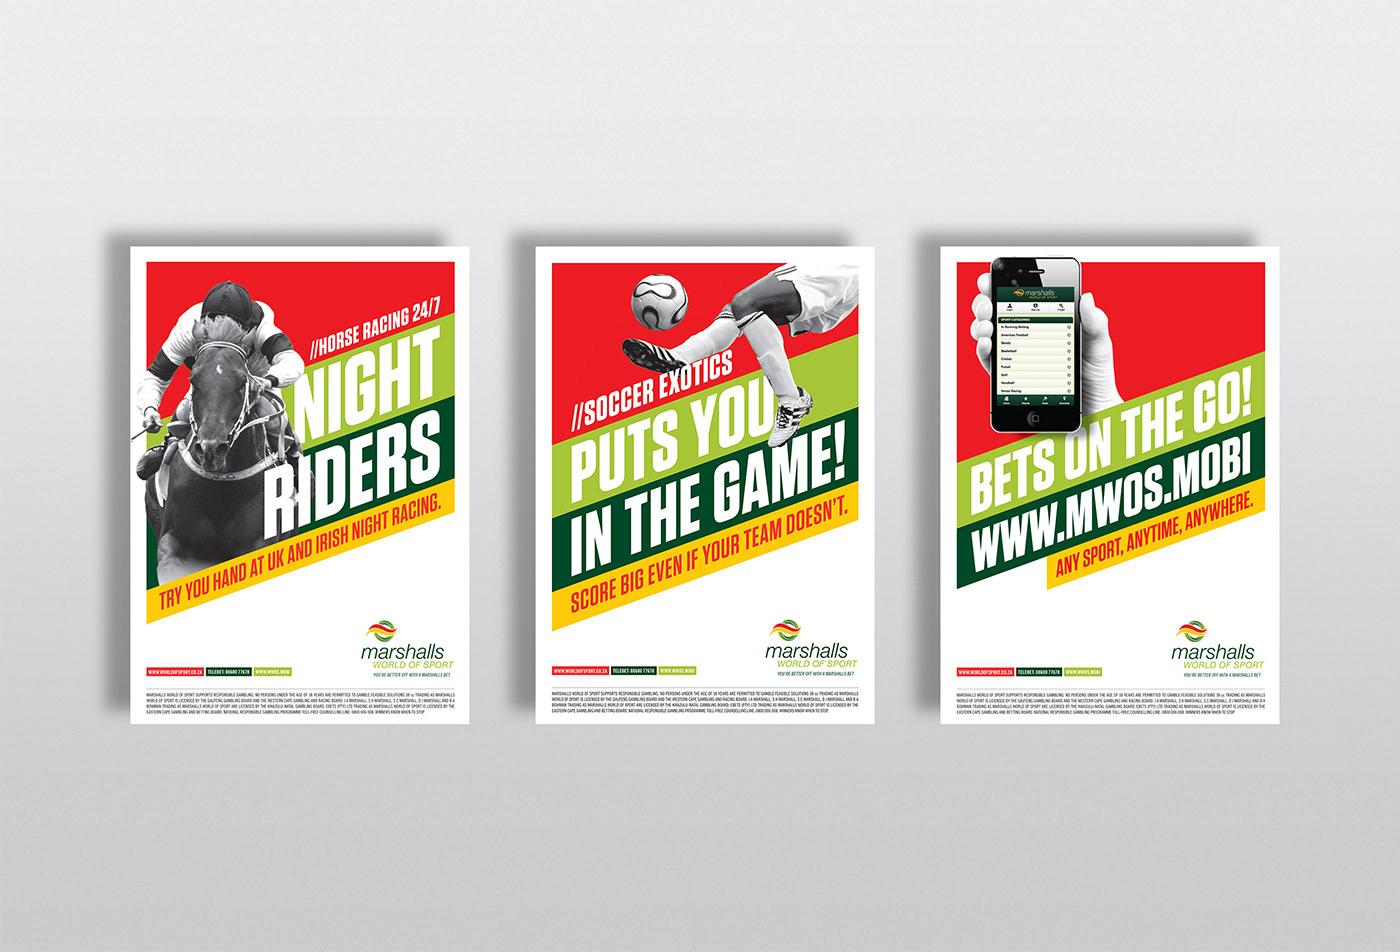 Kwazulu-Natal Gambling Board Products and Services